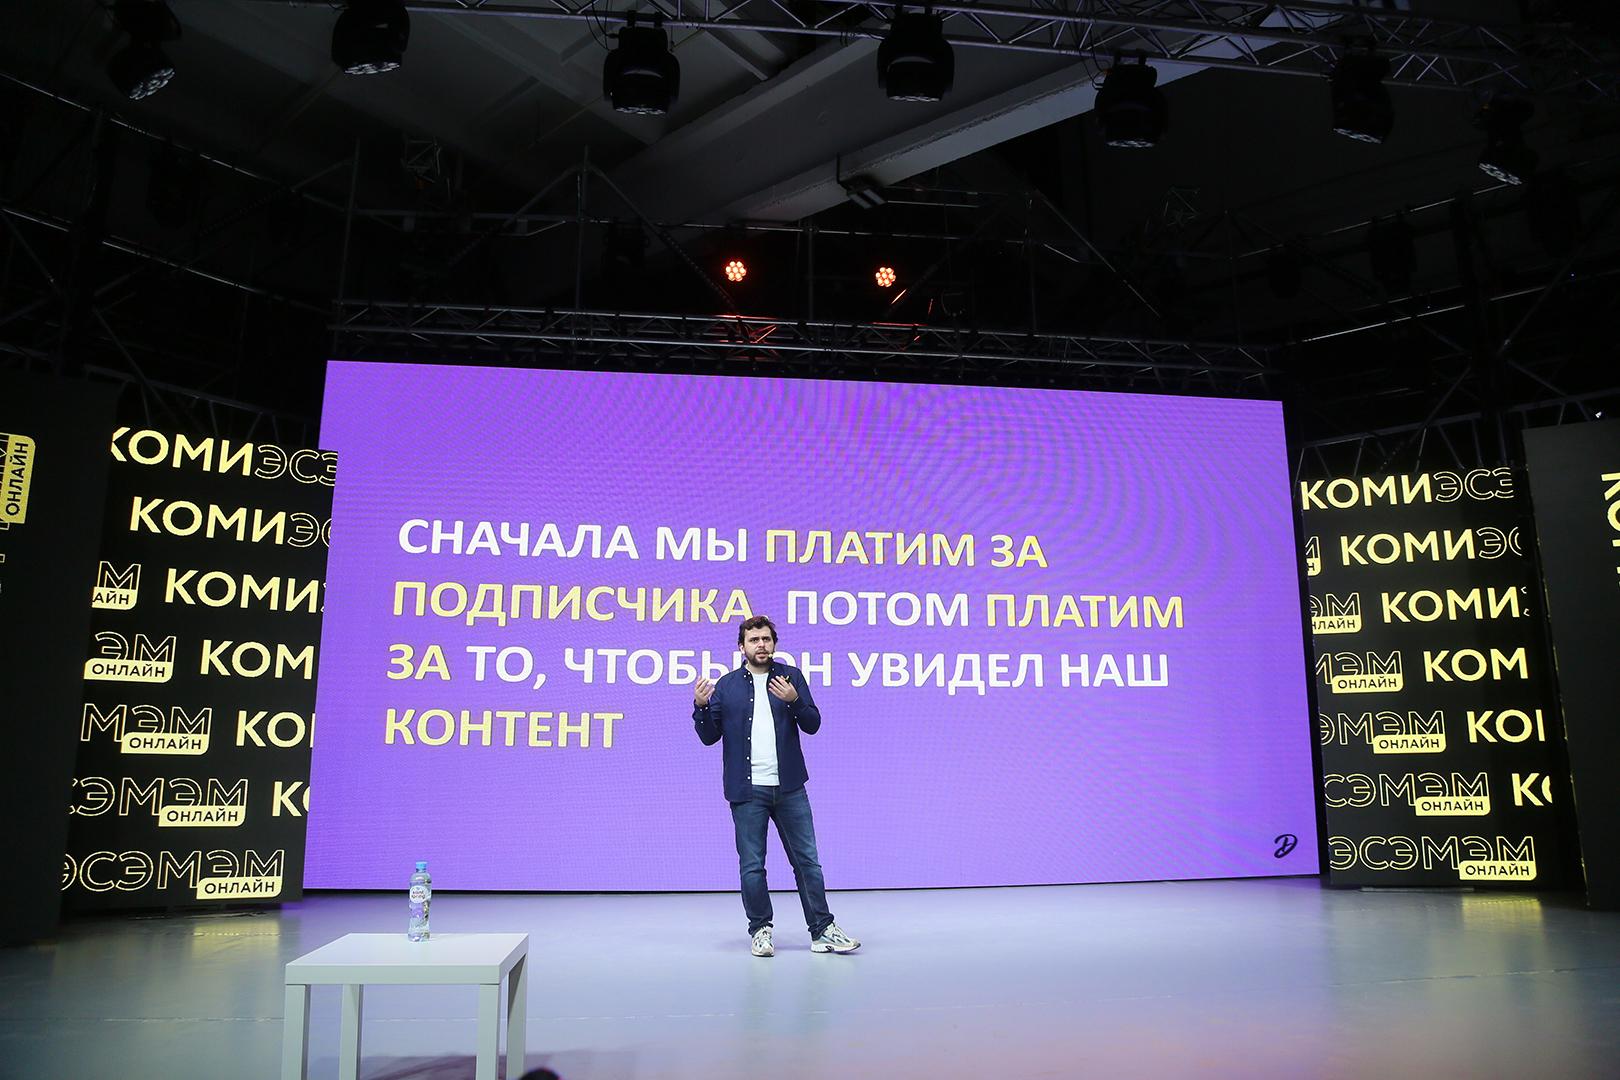 тренды инстаграм 2021